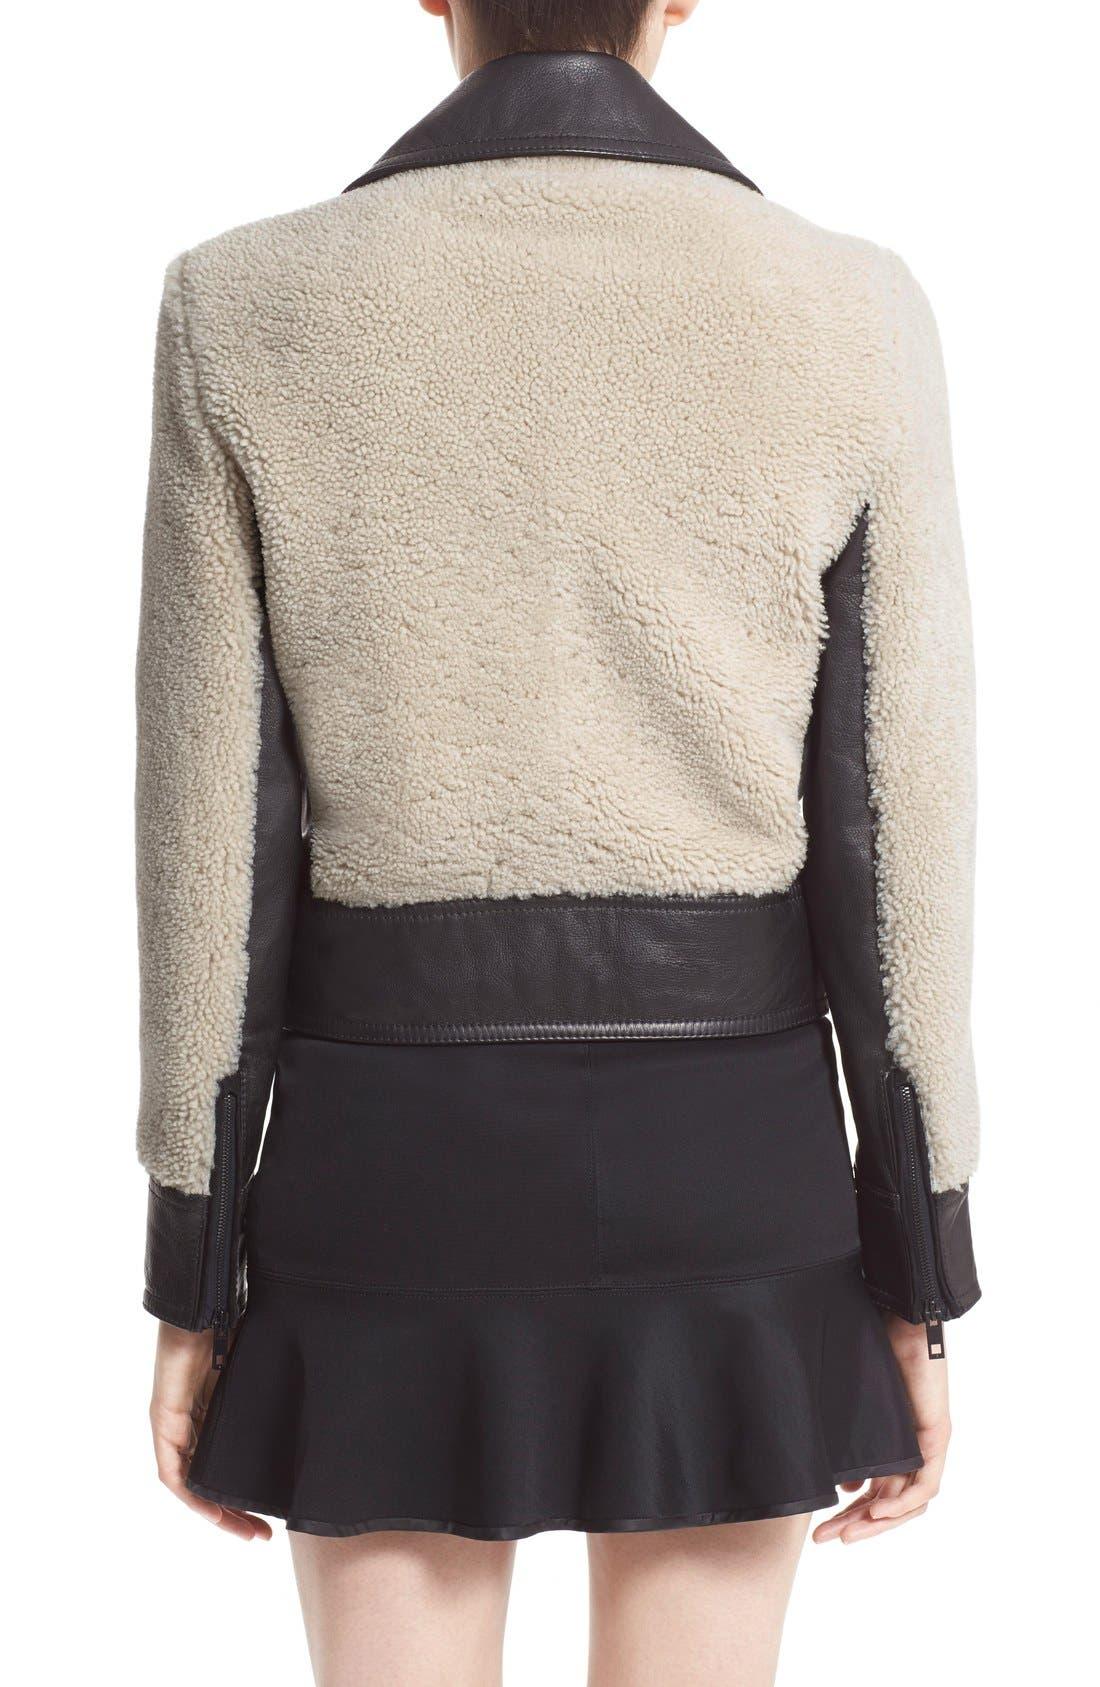 Alternate Image 2  - rag & bone 'Billie' Leather TrimGenuine Shearling Jacket